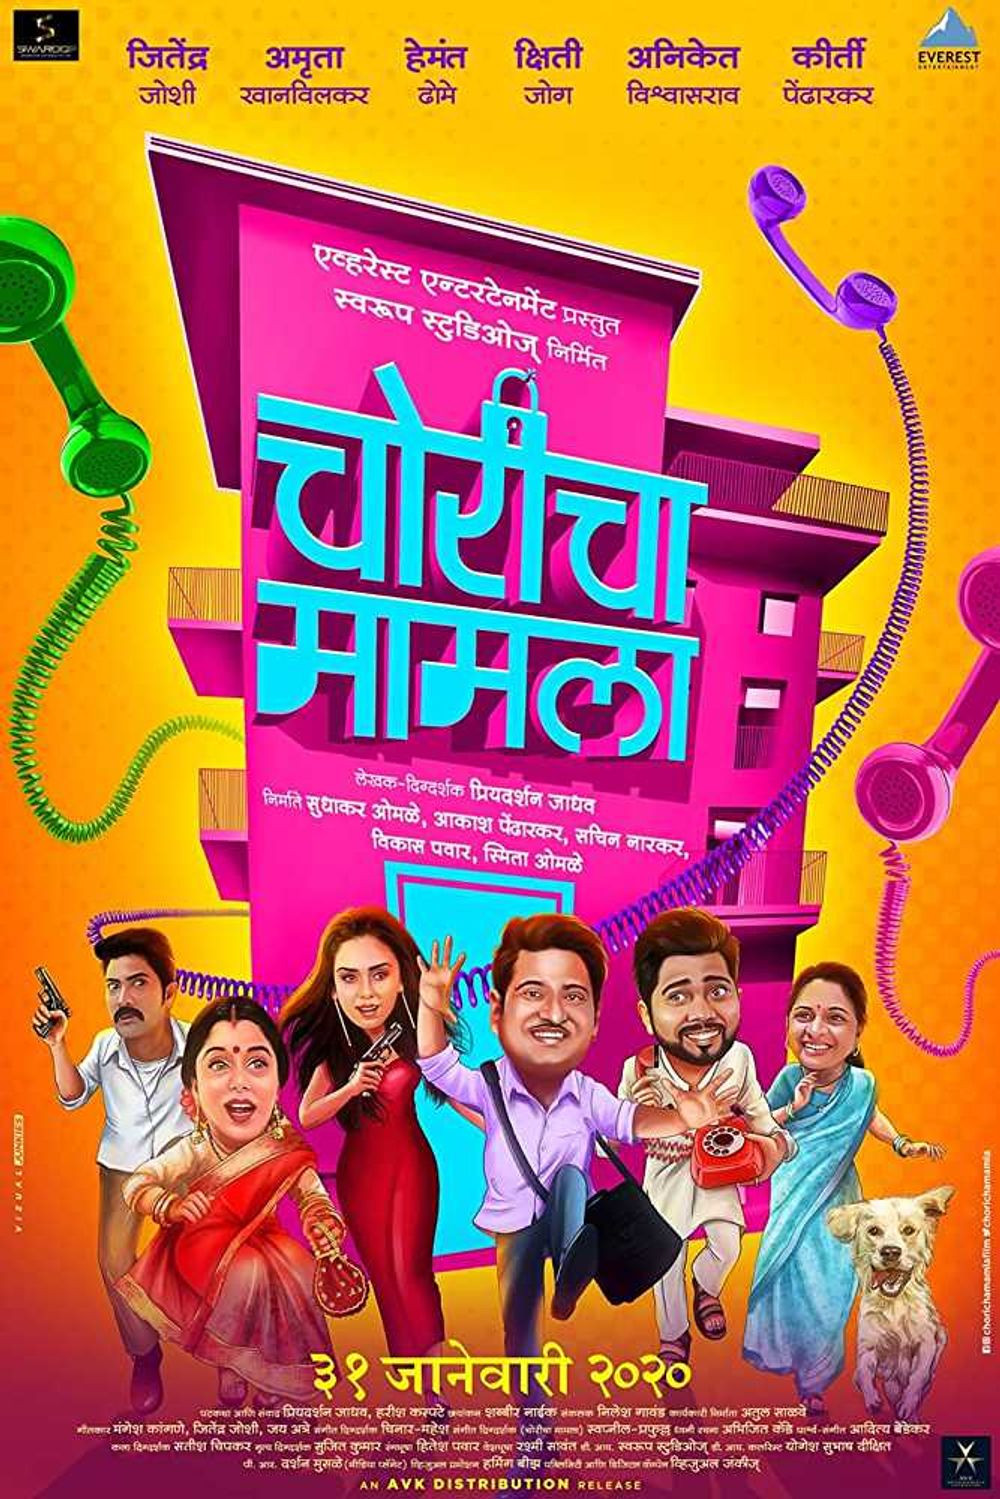 Choricha Mamla 2020 Marathi 400MB PreDVDRip Download